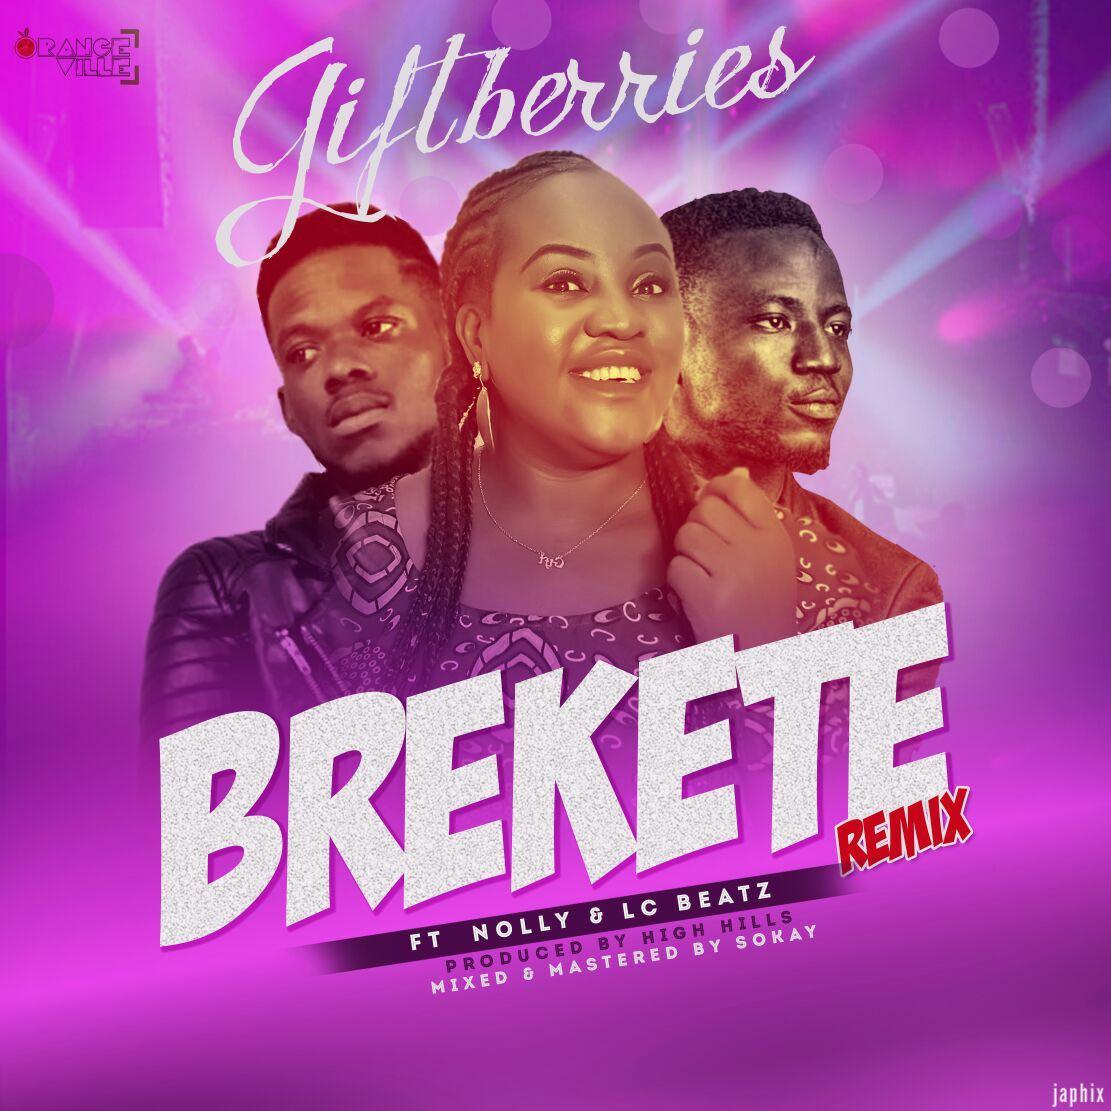 "DOWNLOAD Music: Giftberries – Brekete ""Remix"" (ft. Lc Beatz & Nolly)"